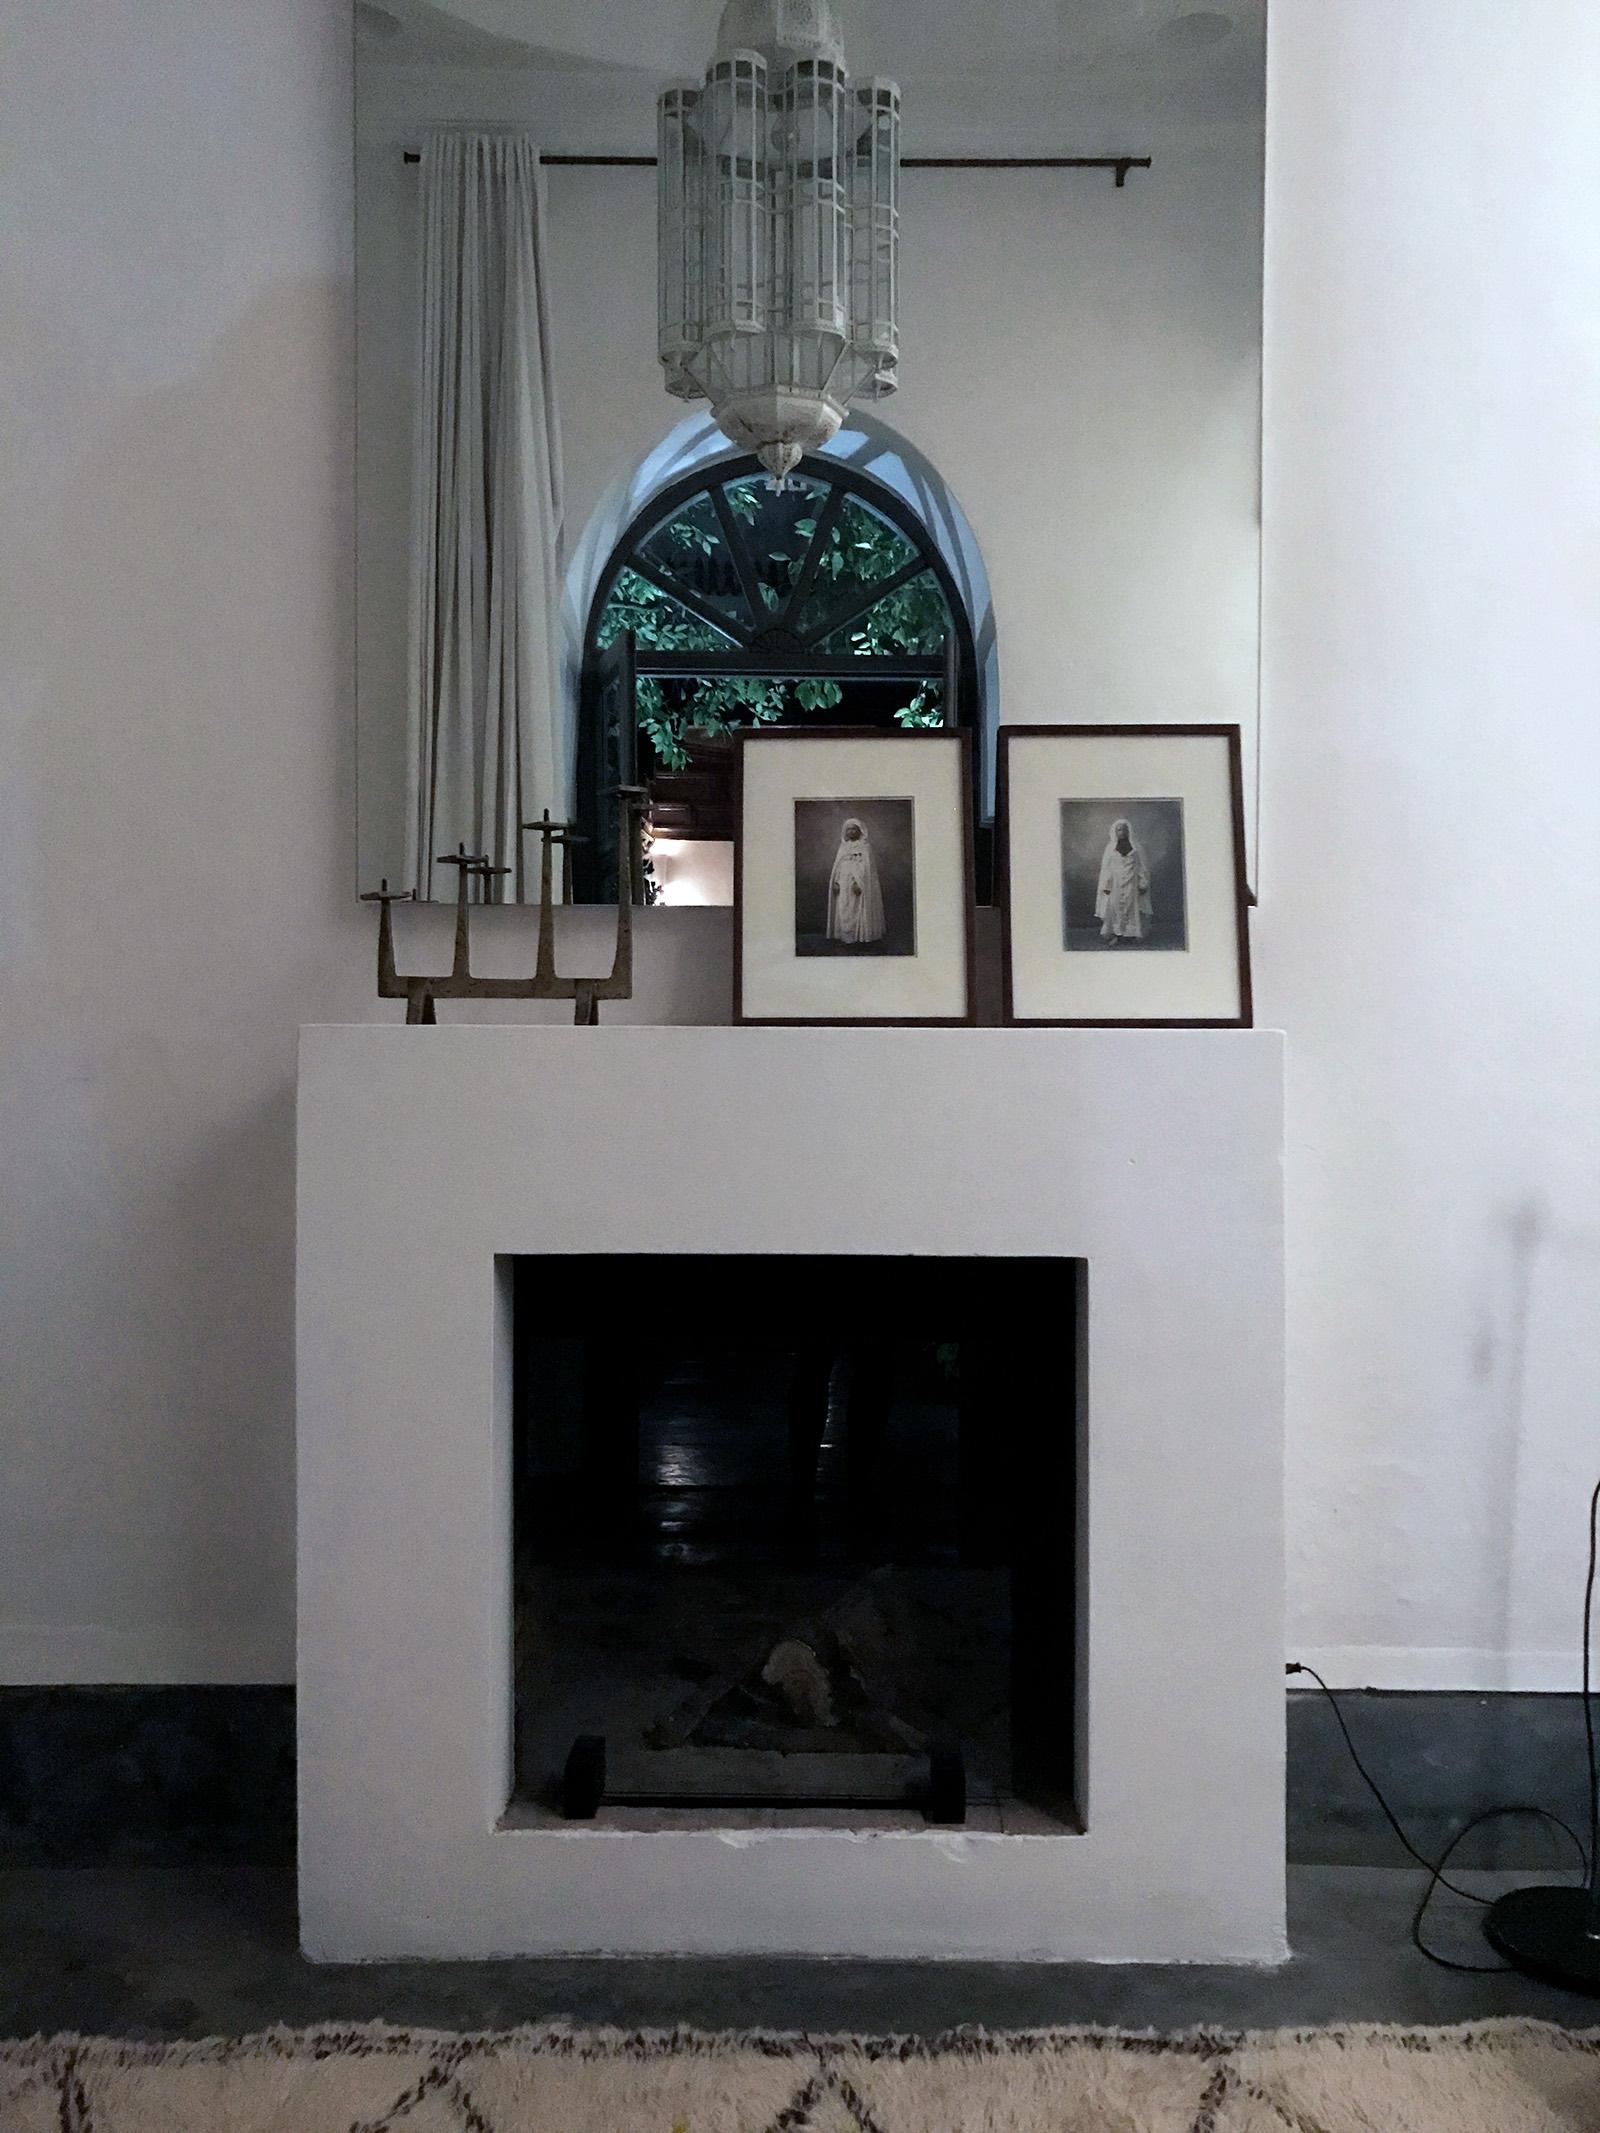 Marrakesh-Riad-Be-Mena-guest-room-fireplace.jpg